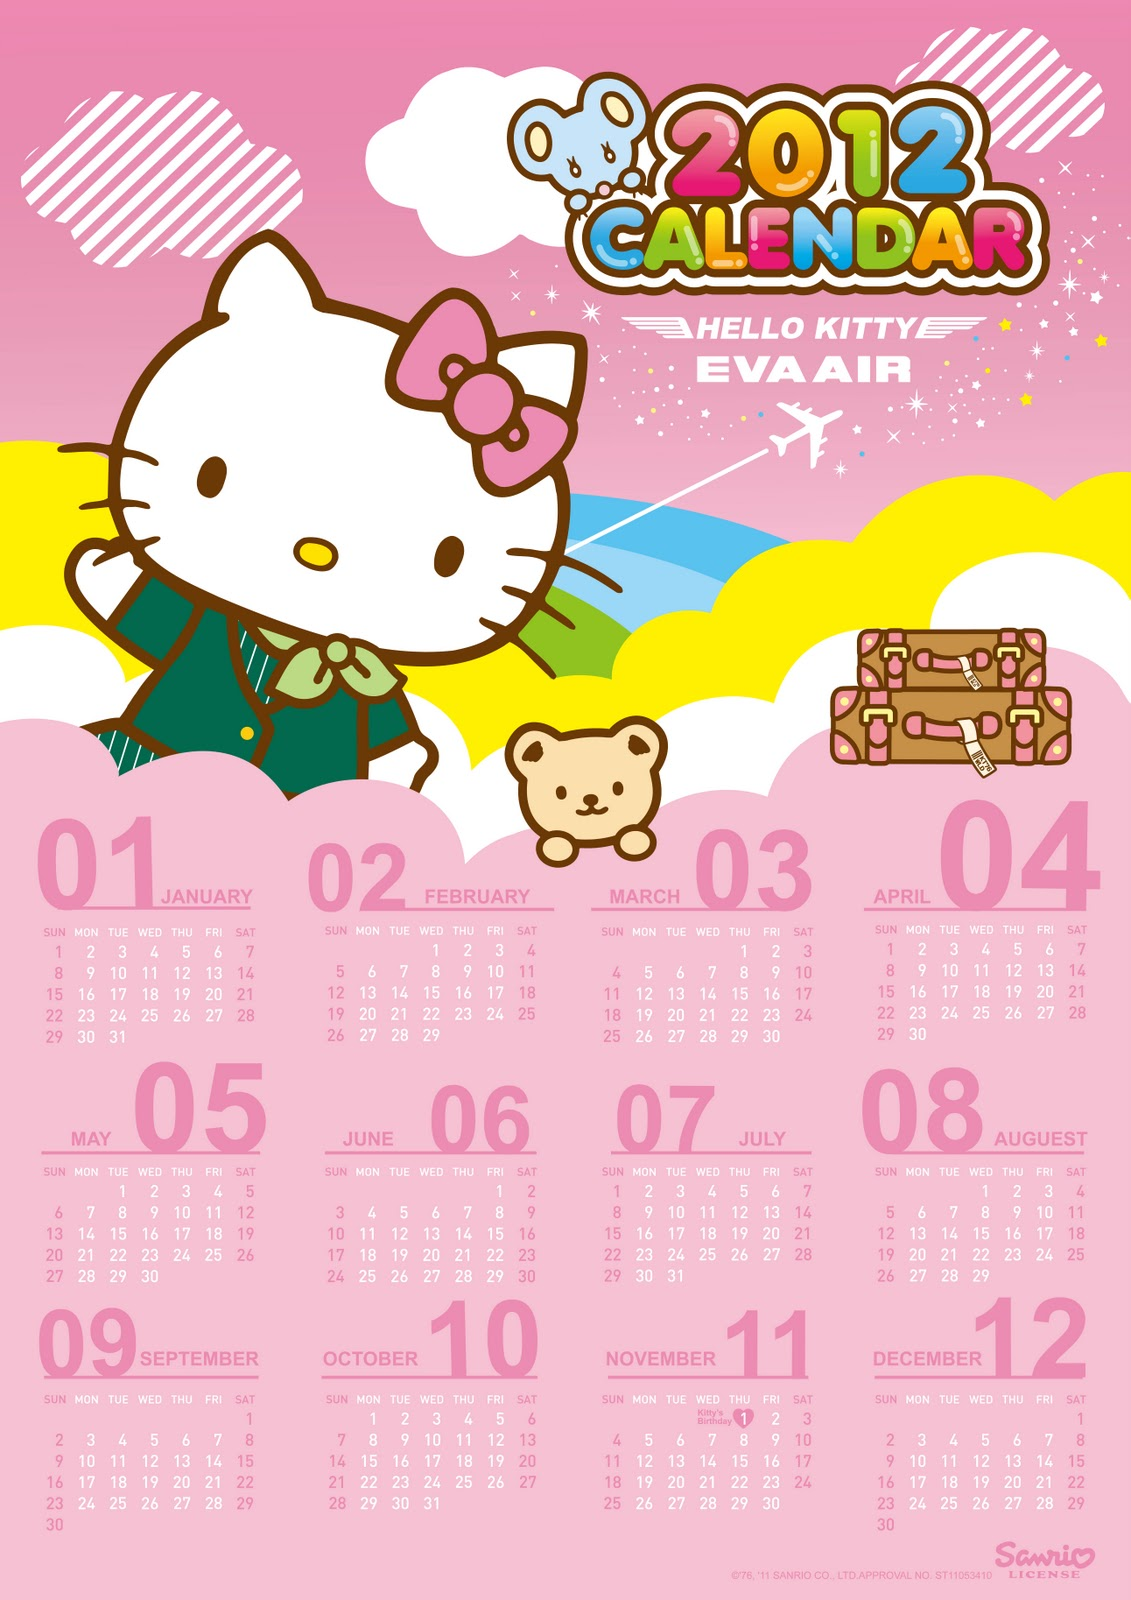 http://4.bp.blogspot.com/-03qAKDraK0s/TwB95eKGDdI/AAAAAAAABec/_jypaZIIUNw/s1600/hello-kitty-2012-calendar-eva-airways.jpg